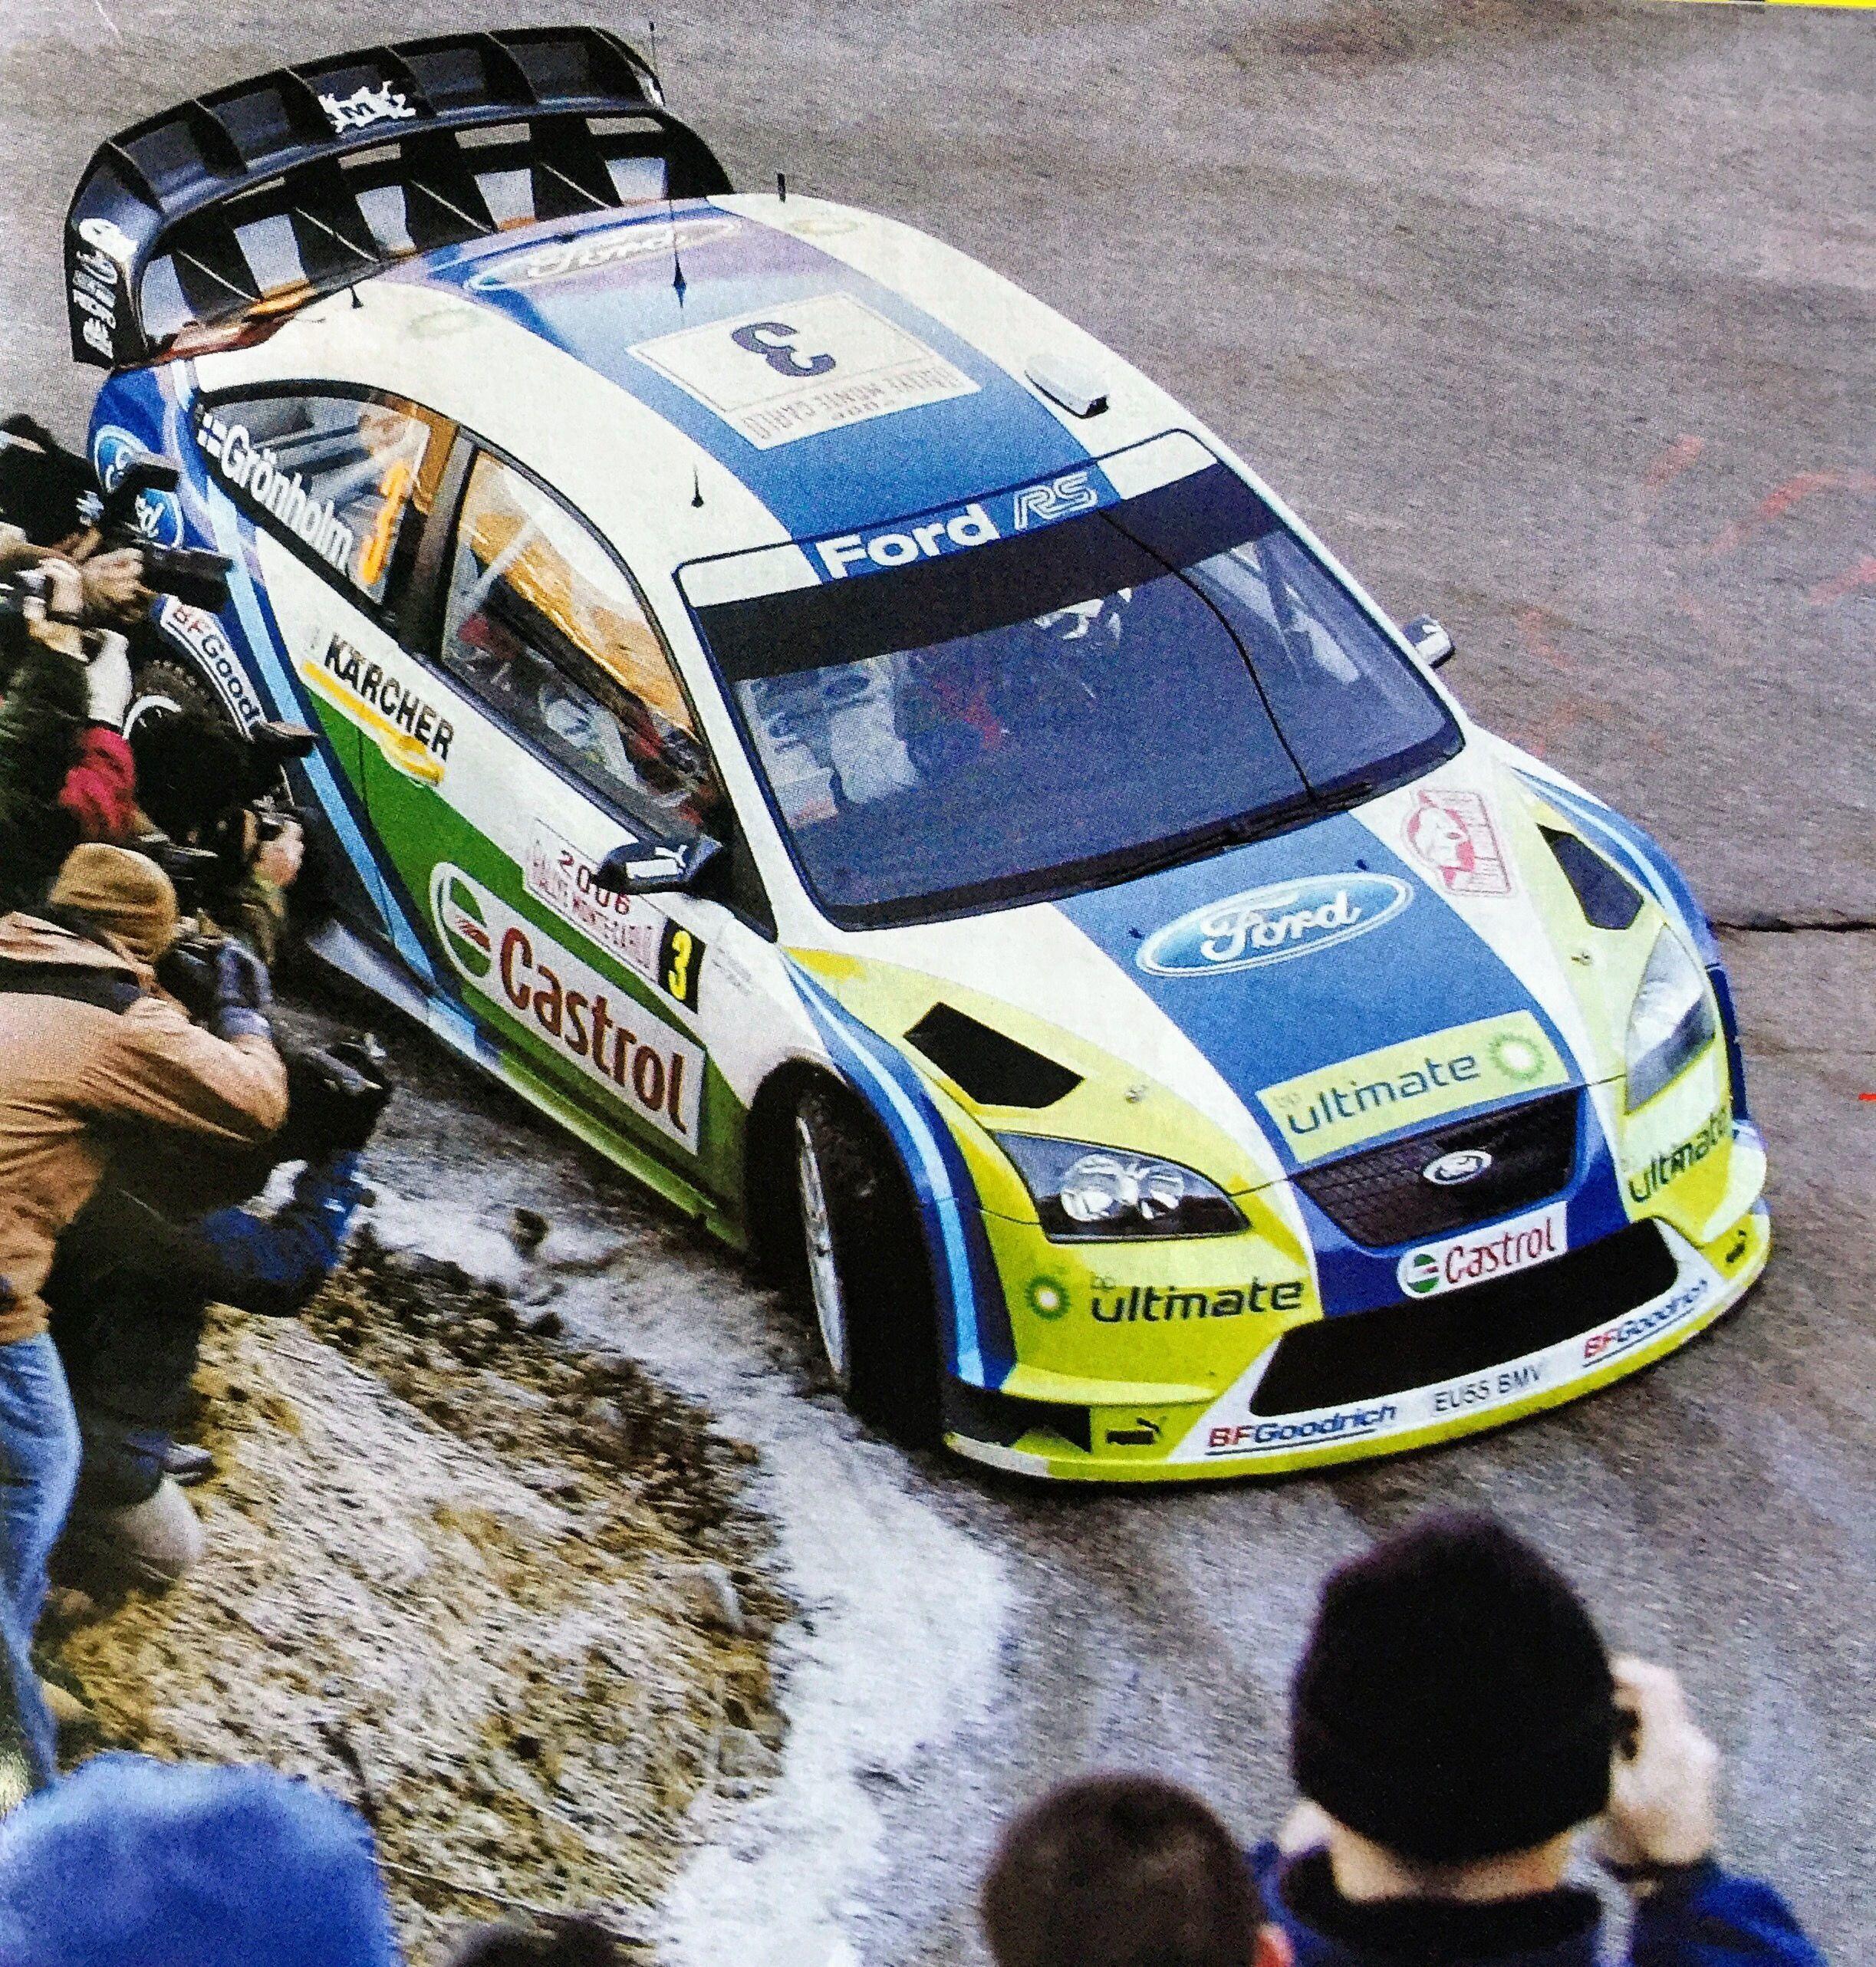 Ford Focus Rs Wrc 06 Gronholm Rautianen Rally Montecarlo 2006